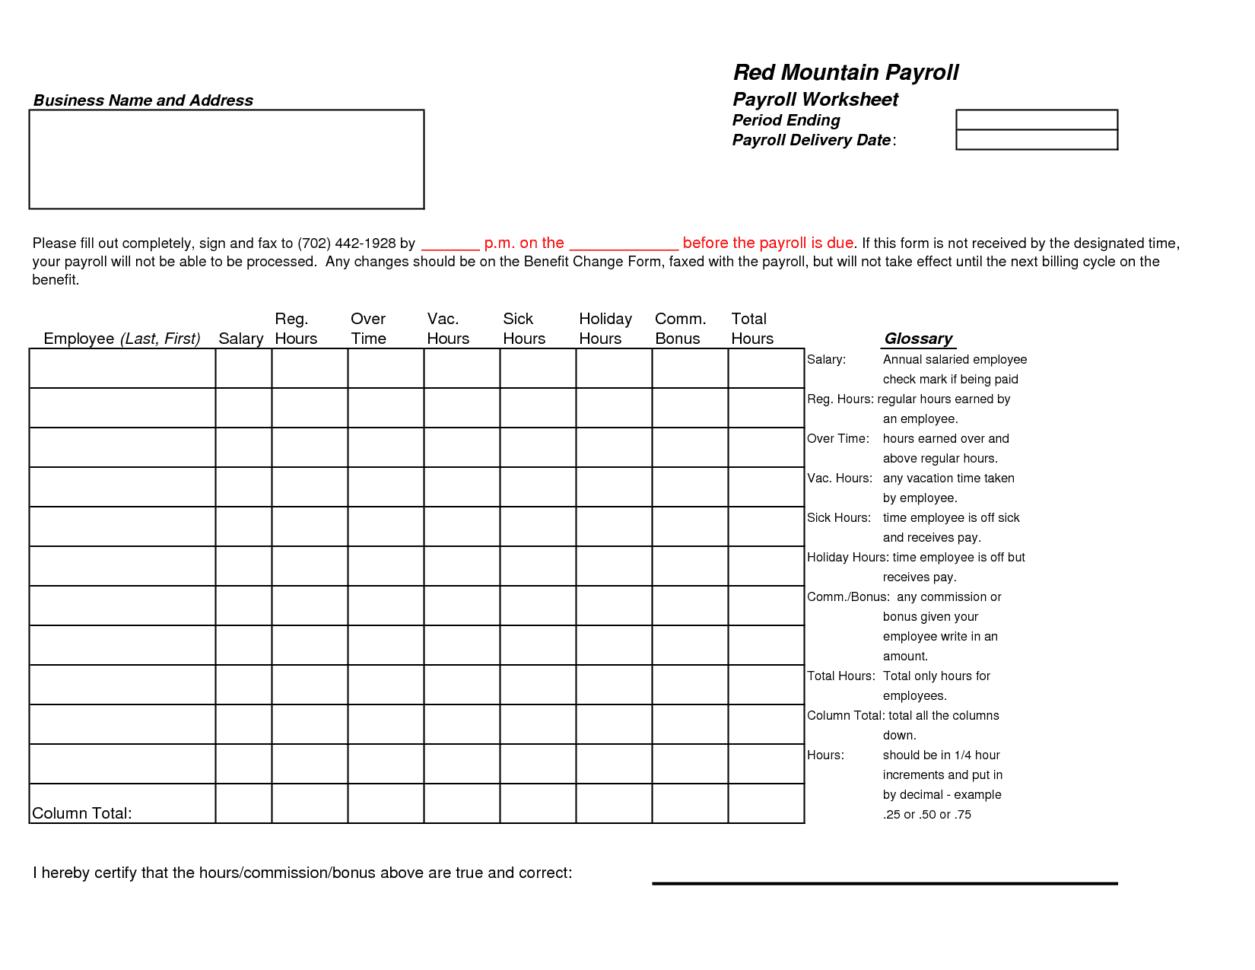 Weekly Payroll Spreadsheet Template Excel Payroll Template 2016 How To Create Payroll In Excel Free Payroll Spreadsheet Excel Payroll Template 2015 Payroll Calculation In Excel Sheet Payroll Template Excel  Excel Certified Payroll Template Free Payroll Spreadsheet Template Spreadsheet Templates for Busines